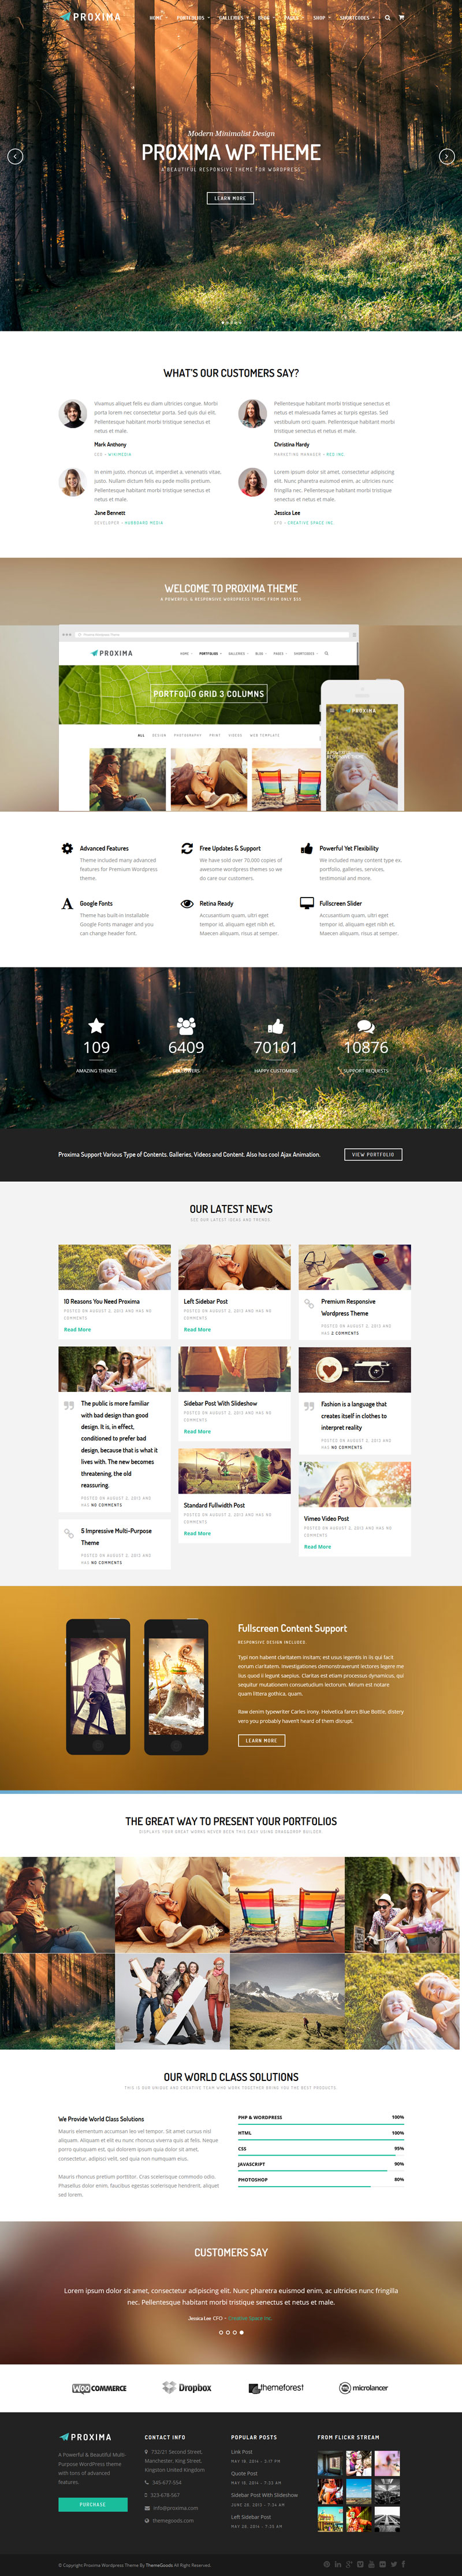 Proxima - Business Theme, flat web design website, example